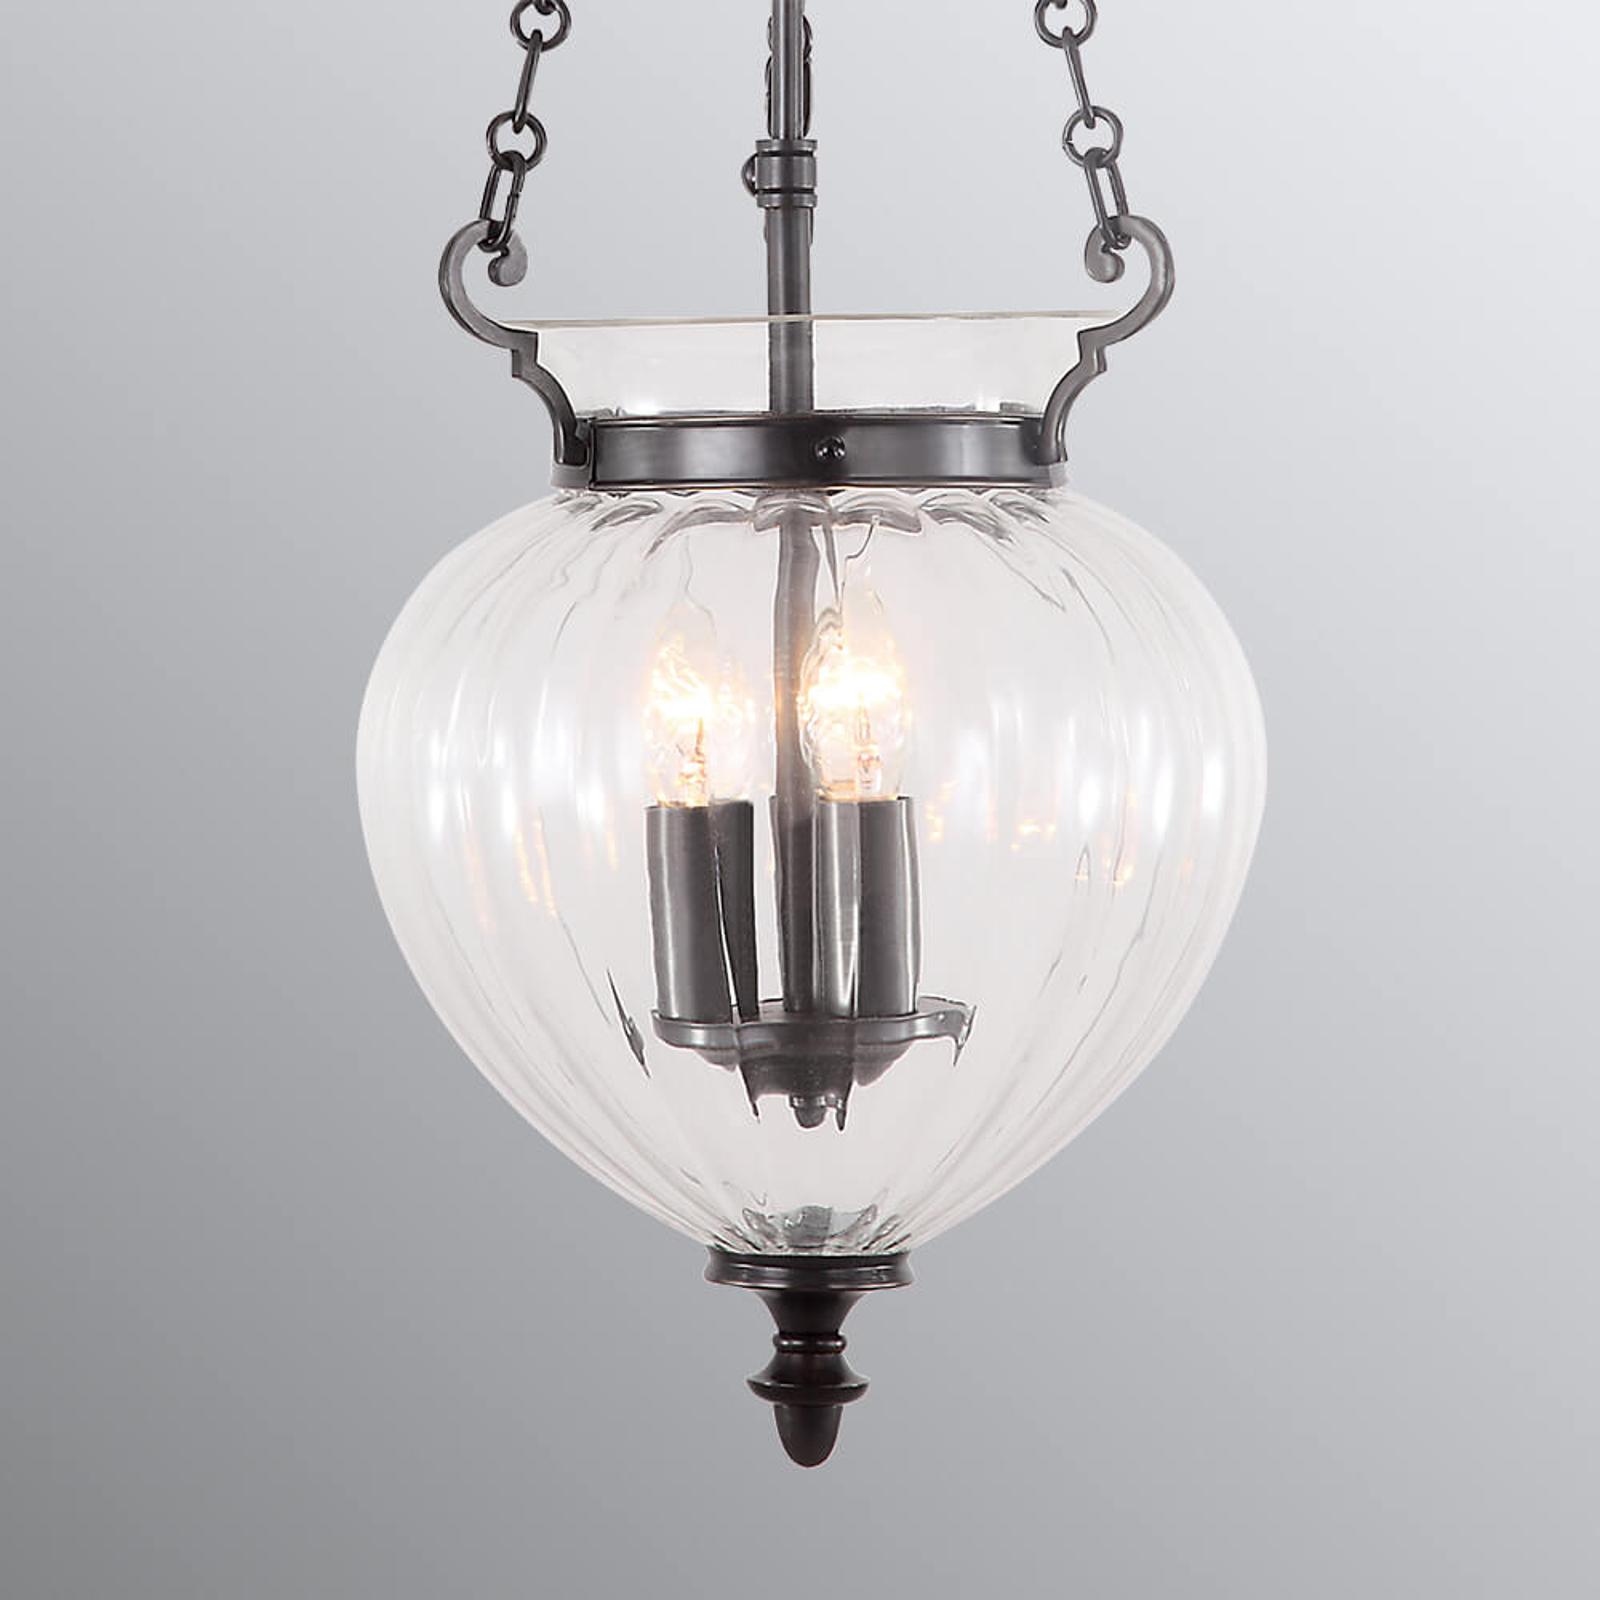 Lampa wisząca Finsbury Park, regulowana, brąz